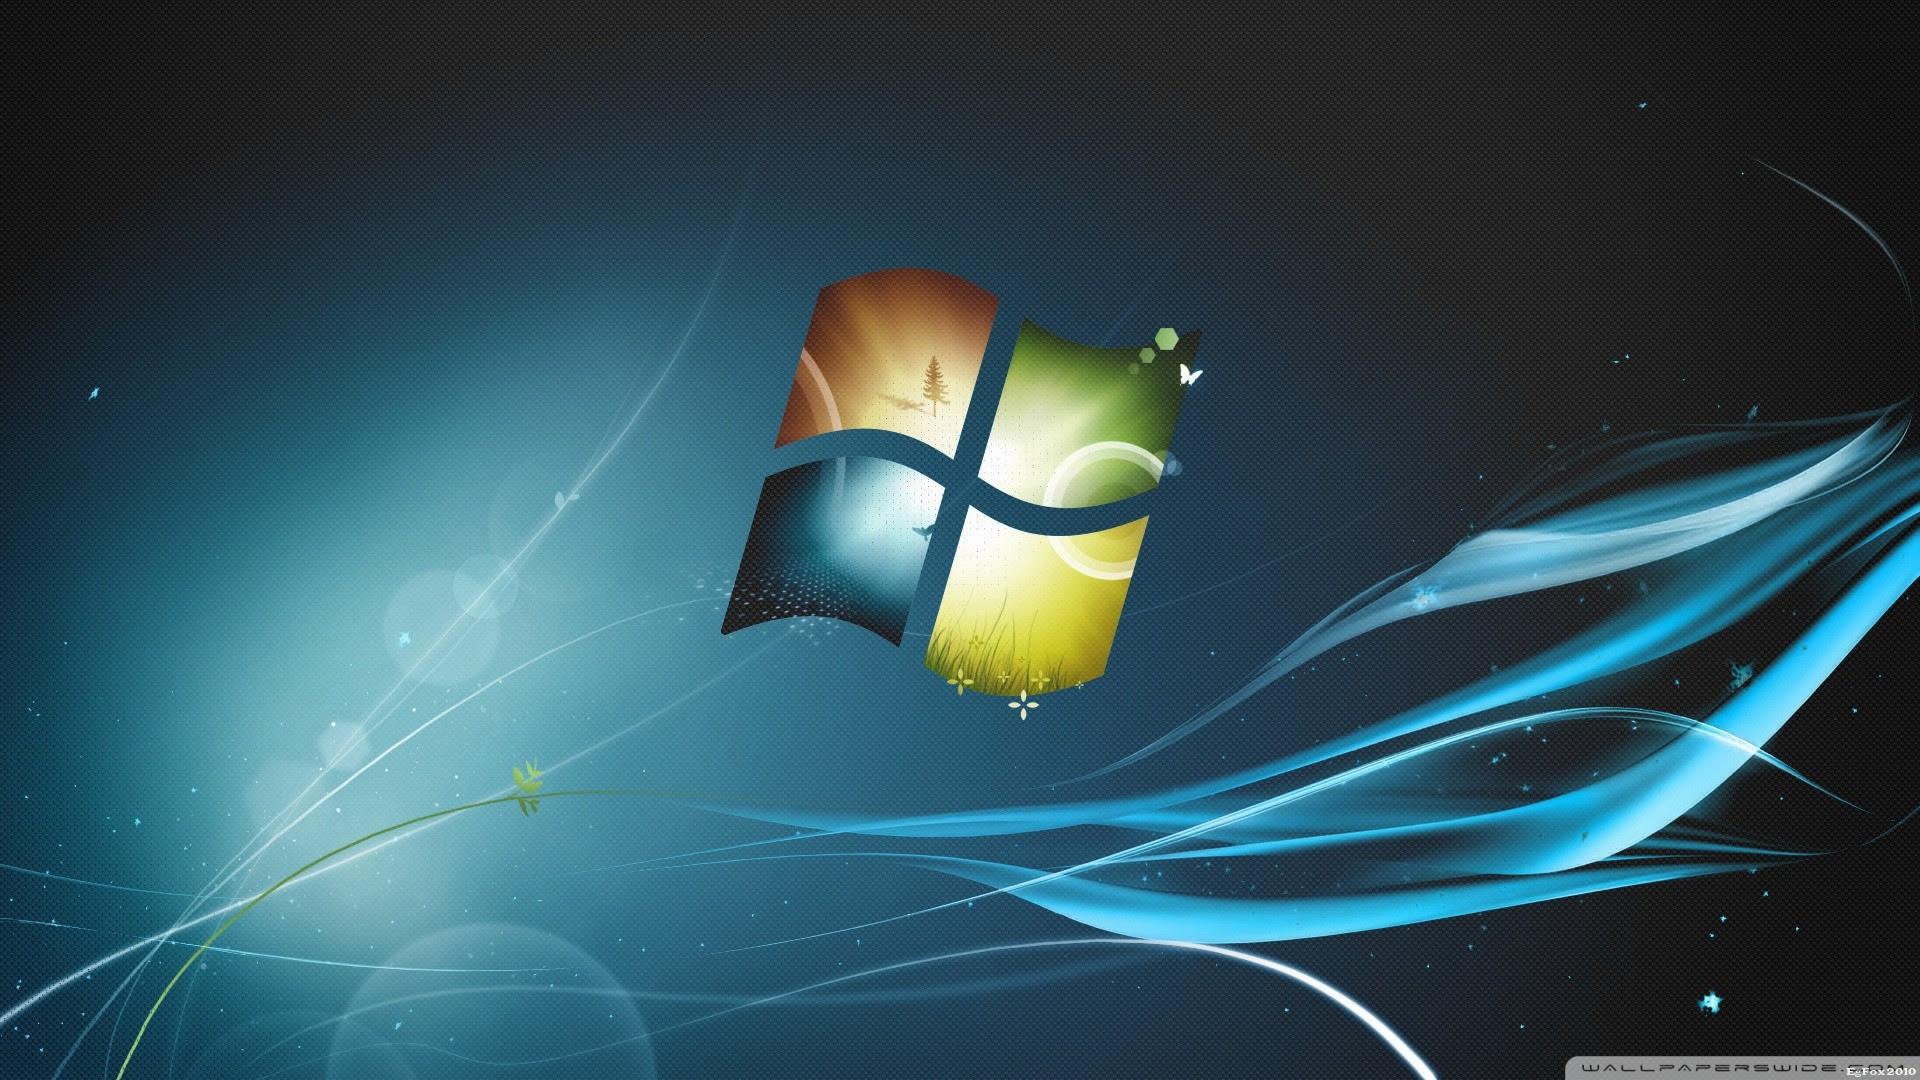 7000 Wallpaper Hd Windows 7 HD Gratis